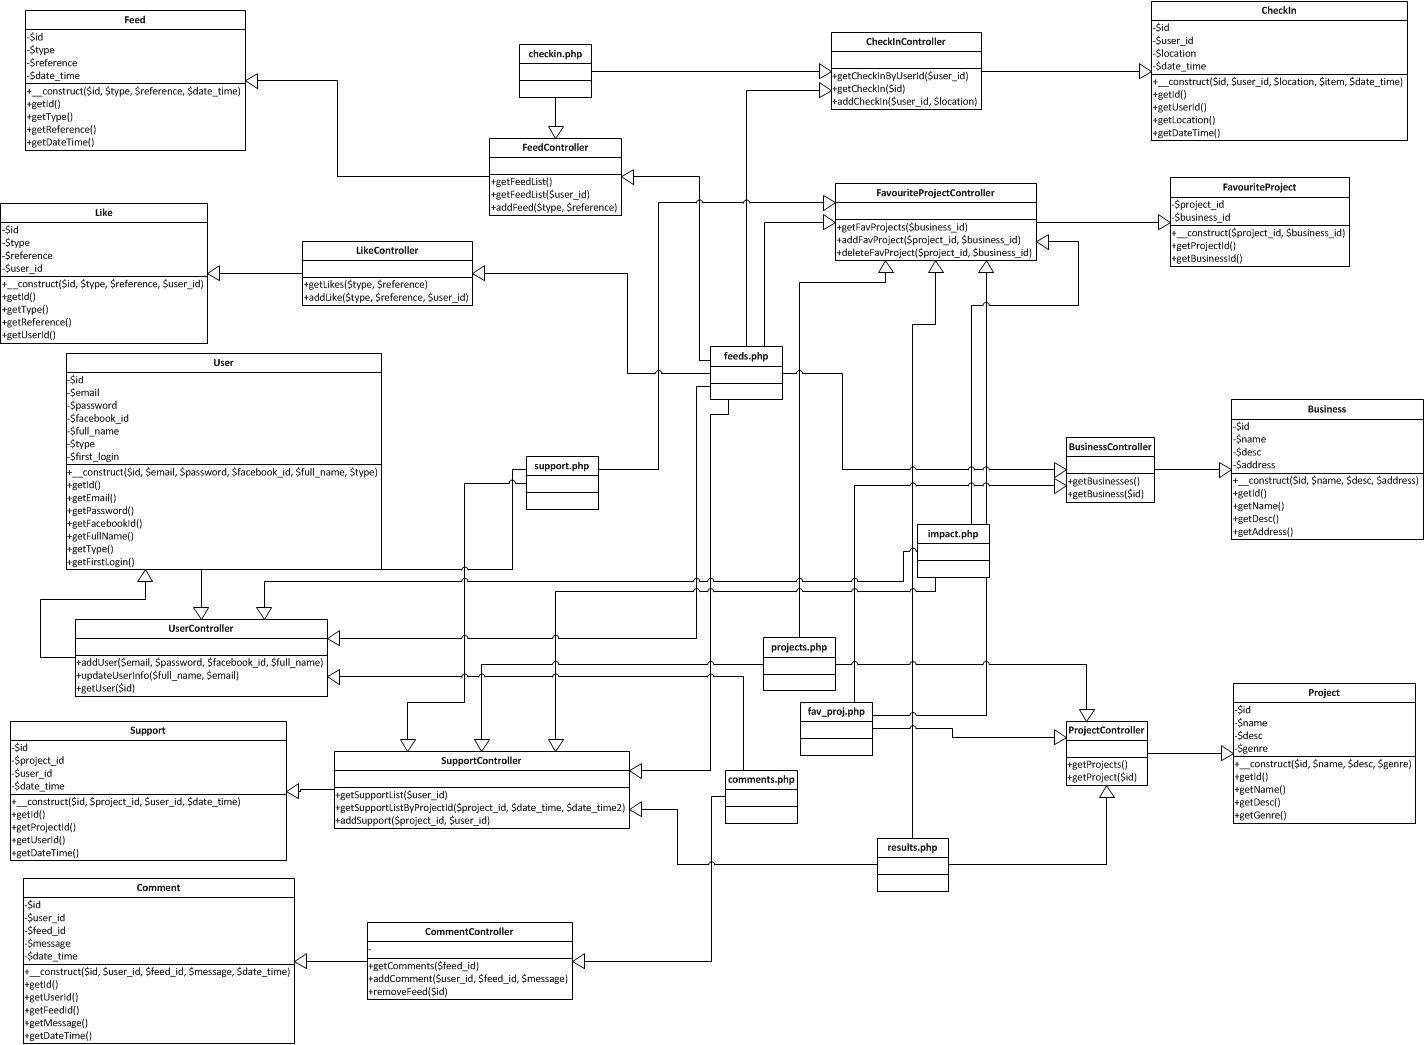 Famous wiki diagram motif electrical diagram ideas piotomarfo is480 team wiki 2012t1 team verendus project documentation diagrams ccuart Images